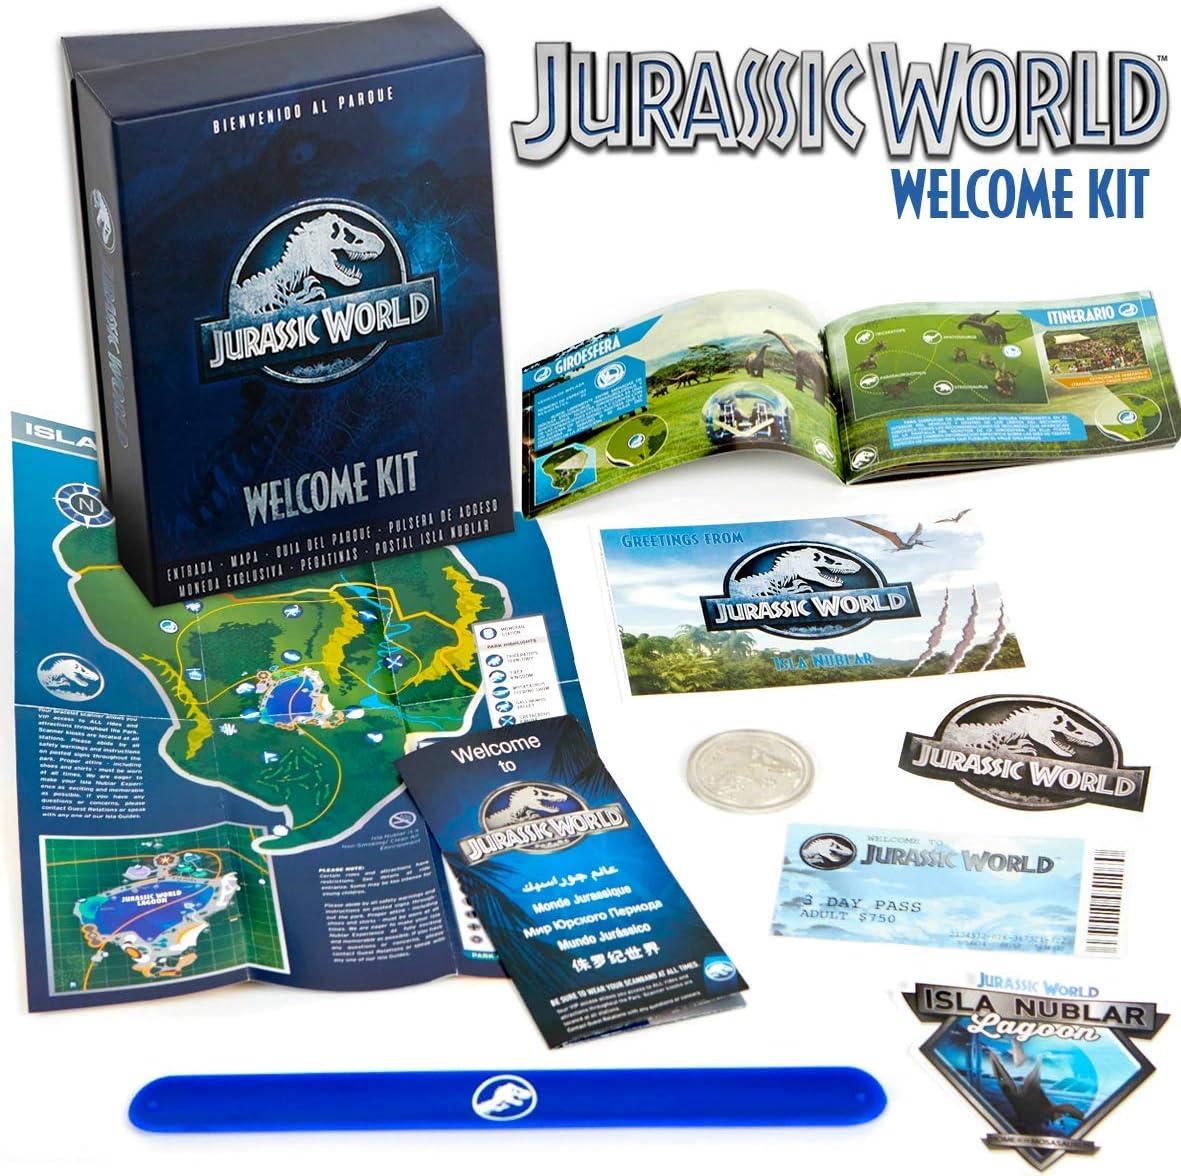 Jurassic World Welcome Kit - (Entrada, Mapa, Pulsera, Guia dinosaurios...)